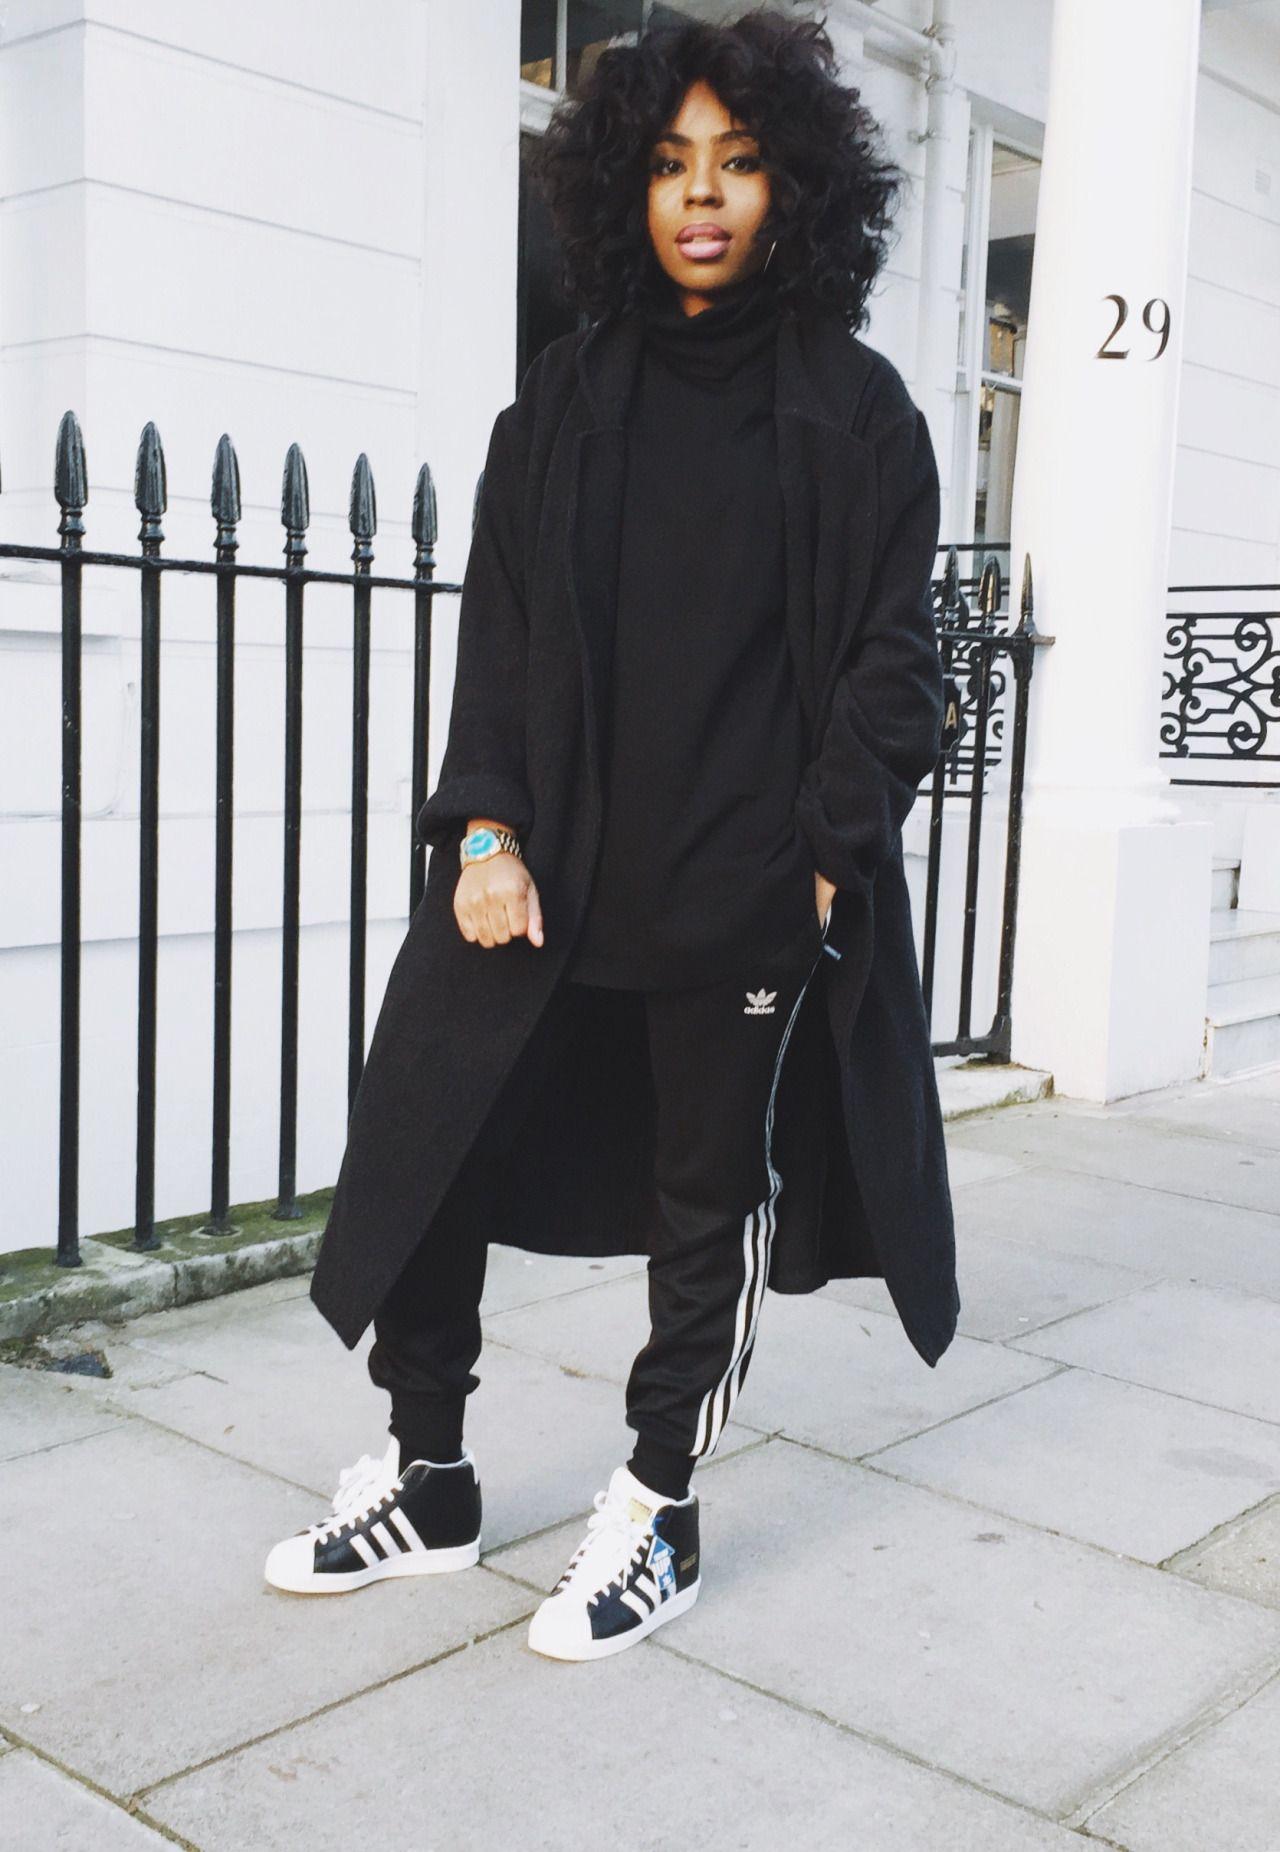 blackfashion: Mercedes Benson, LondonInstagram: @mercedesfbenson mercedesfbenson